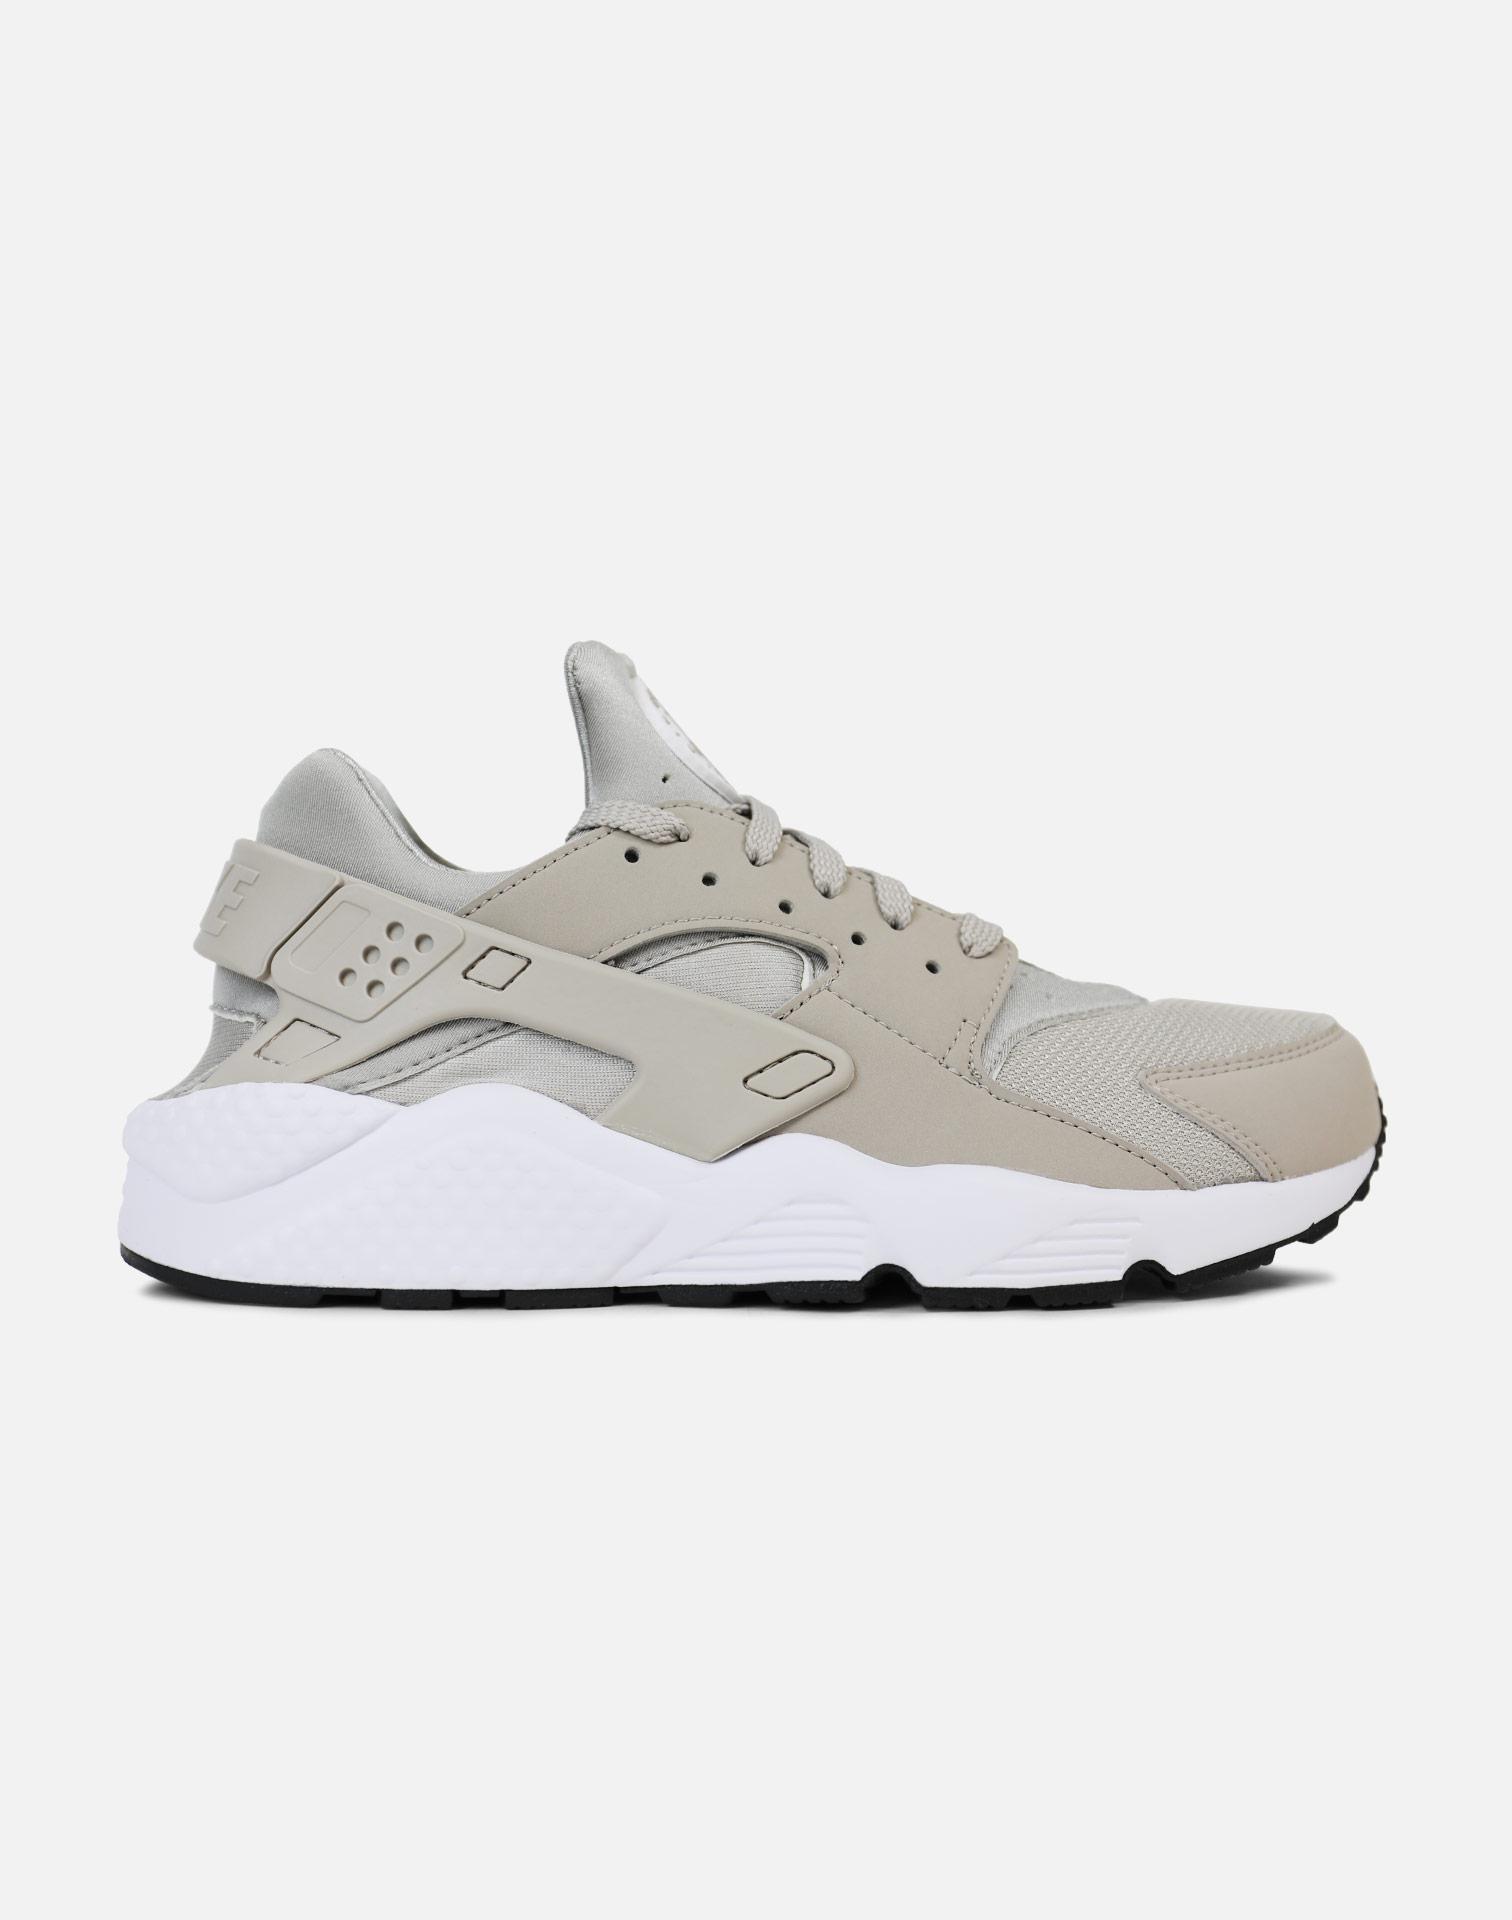 e298342a9e552 Lyst - Nike Air Huarache-cobblestone White Black in Brown for Men